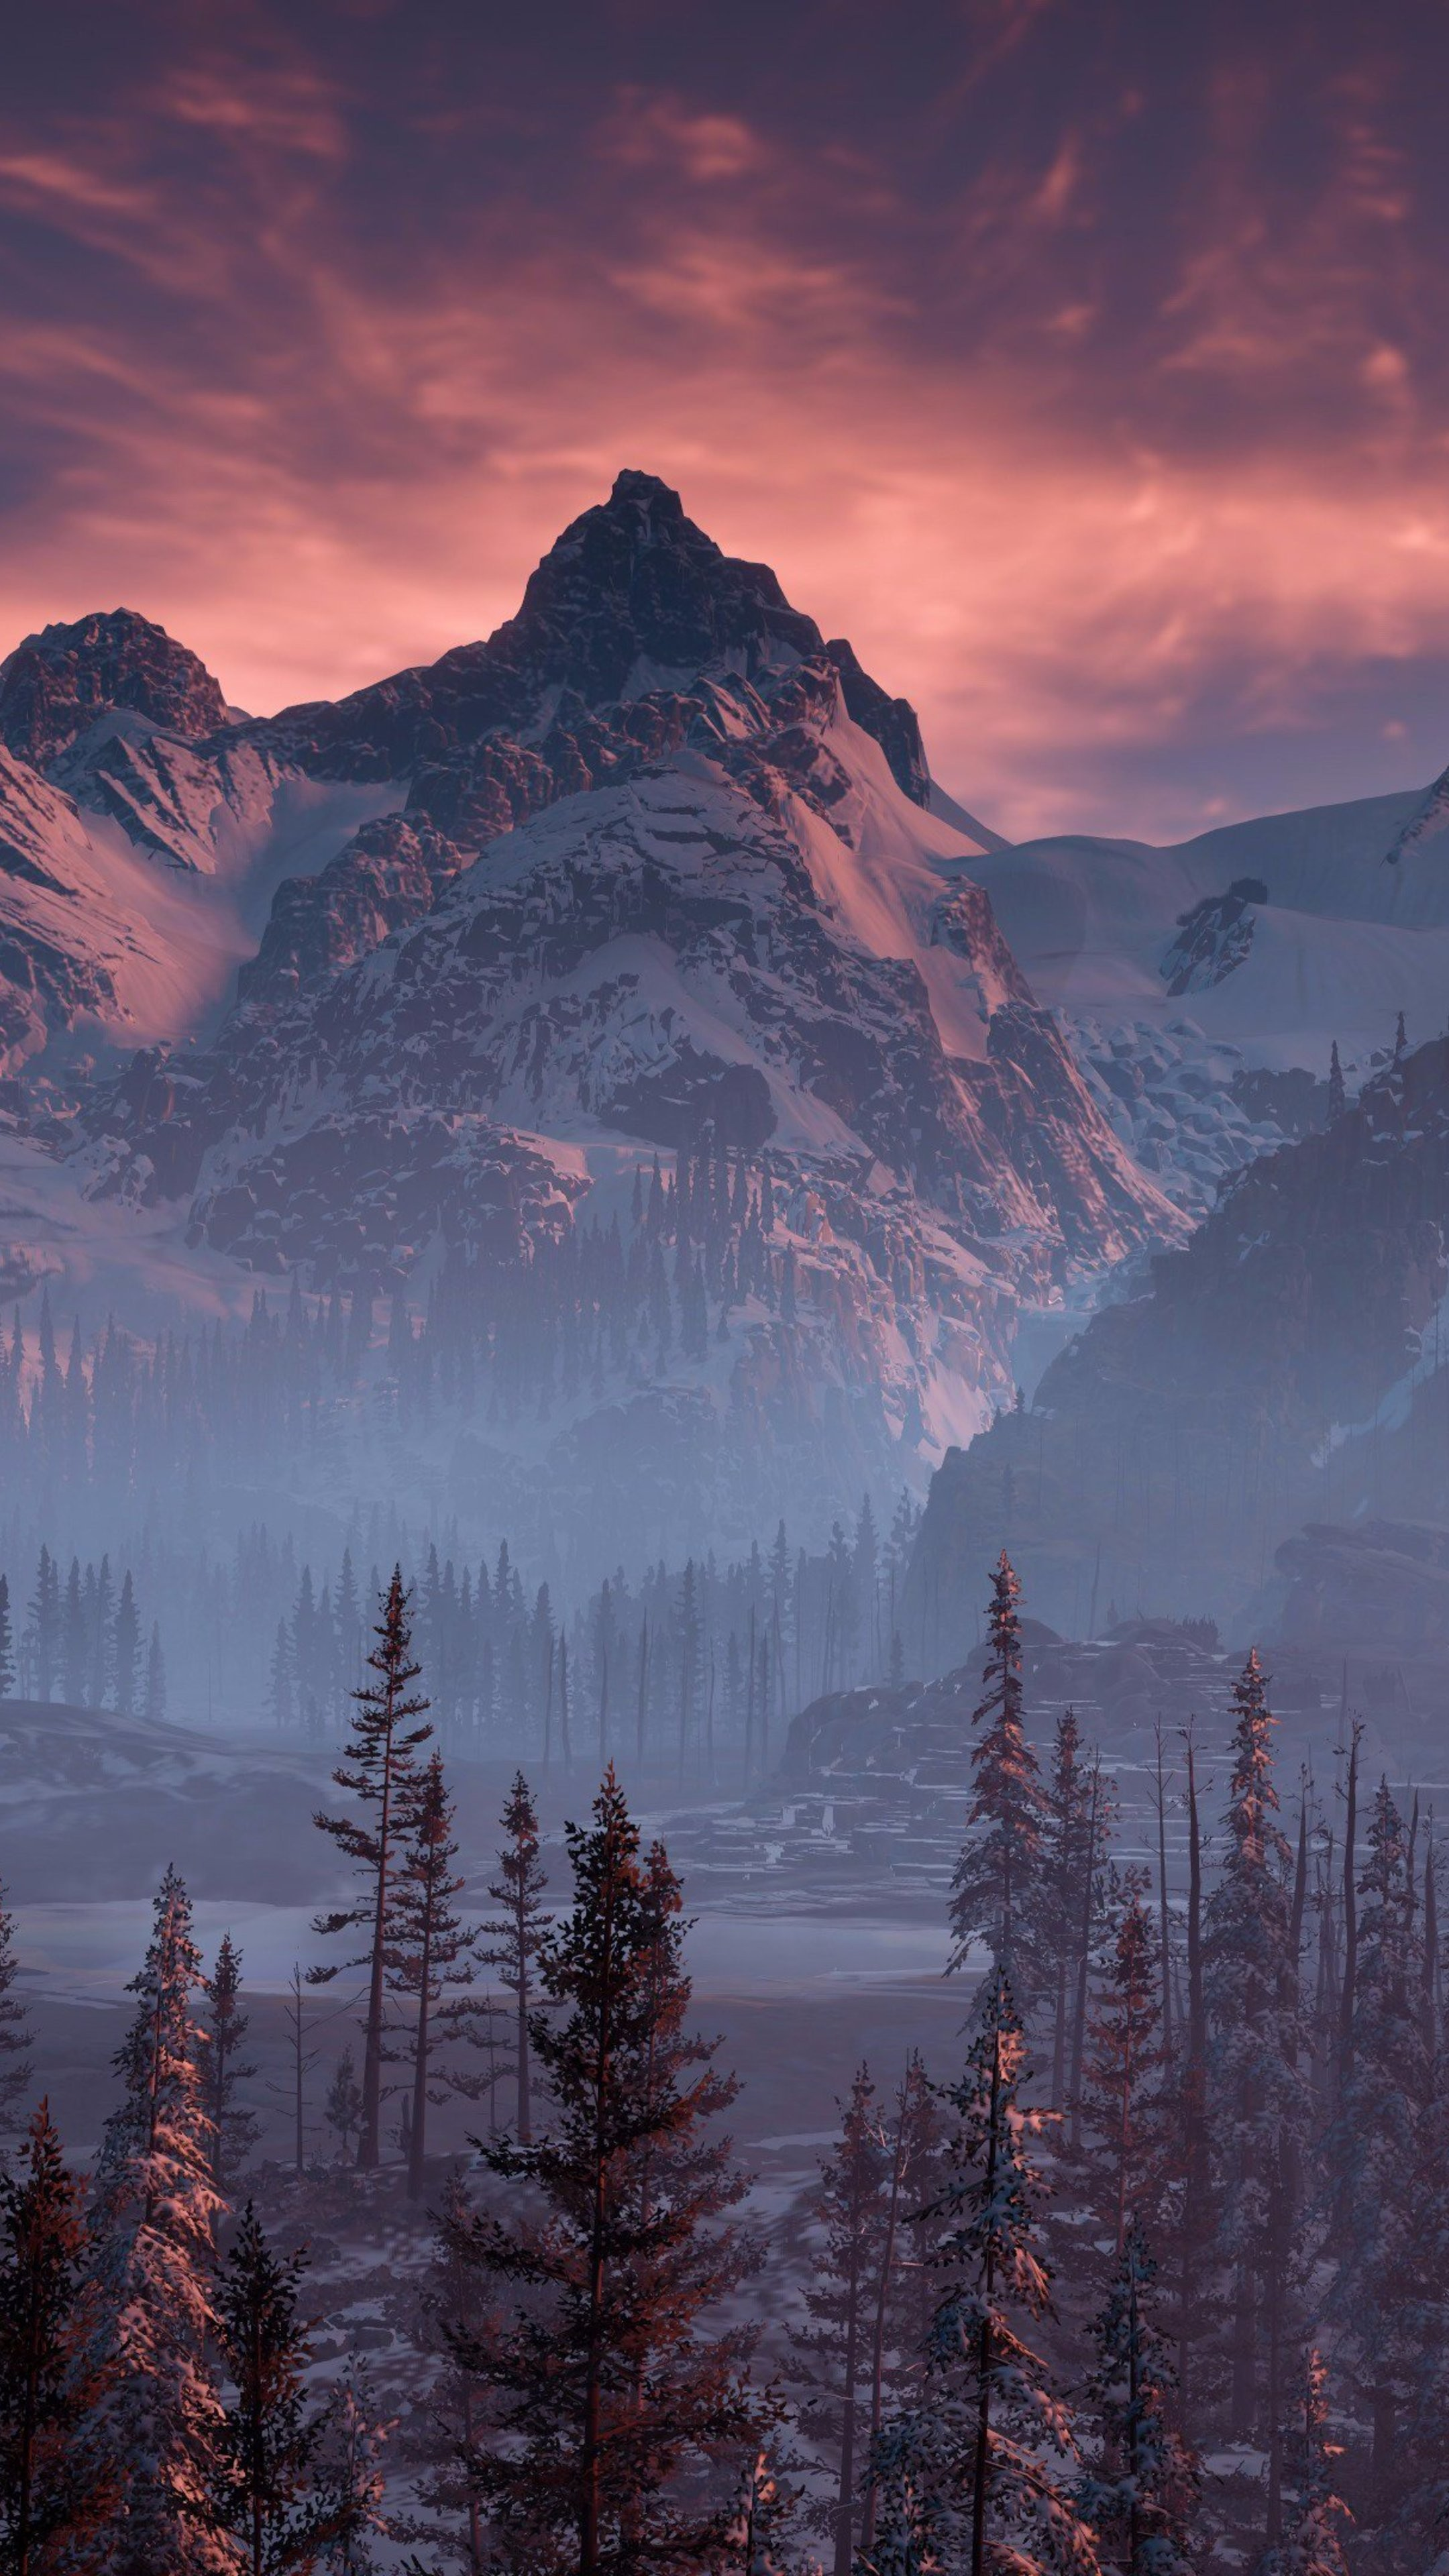 Iphone Wallpapers Hd Zedge Horizon Zero Dawn Nature Mountains Trees Sky Yj Wallpaper